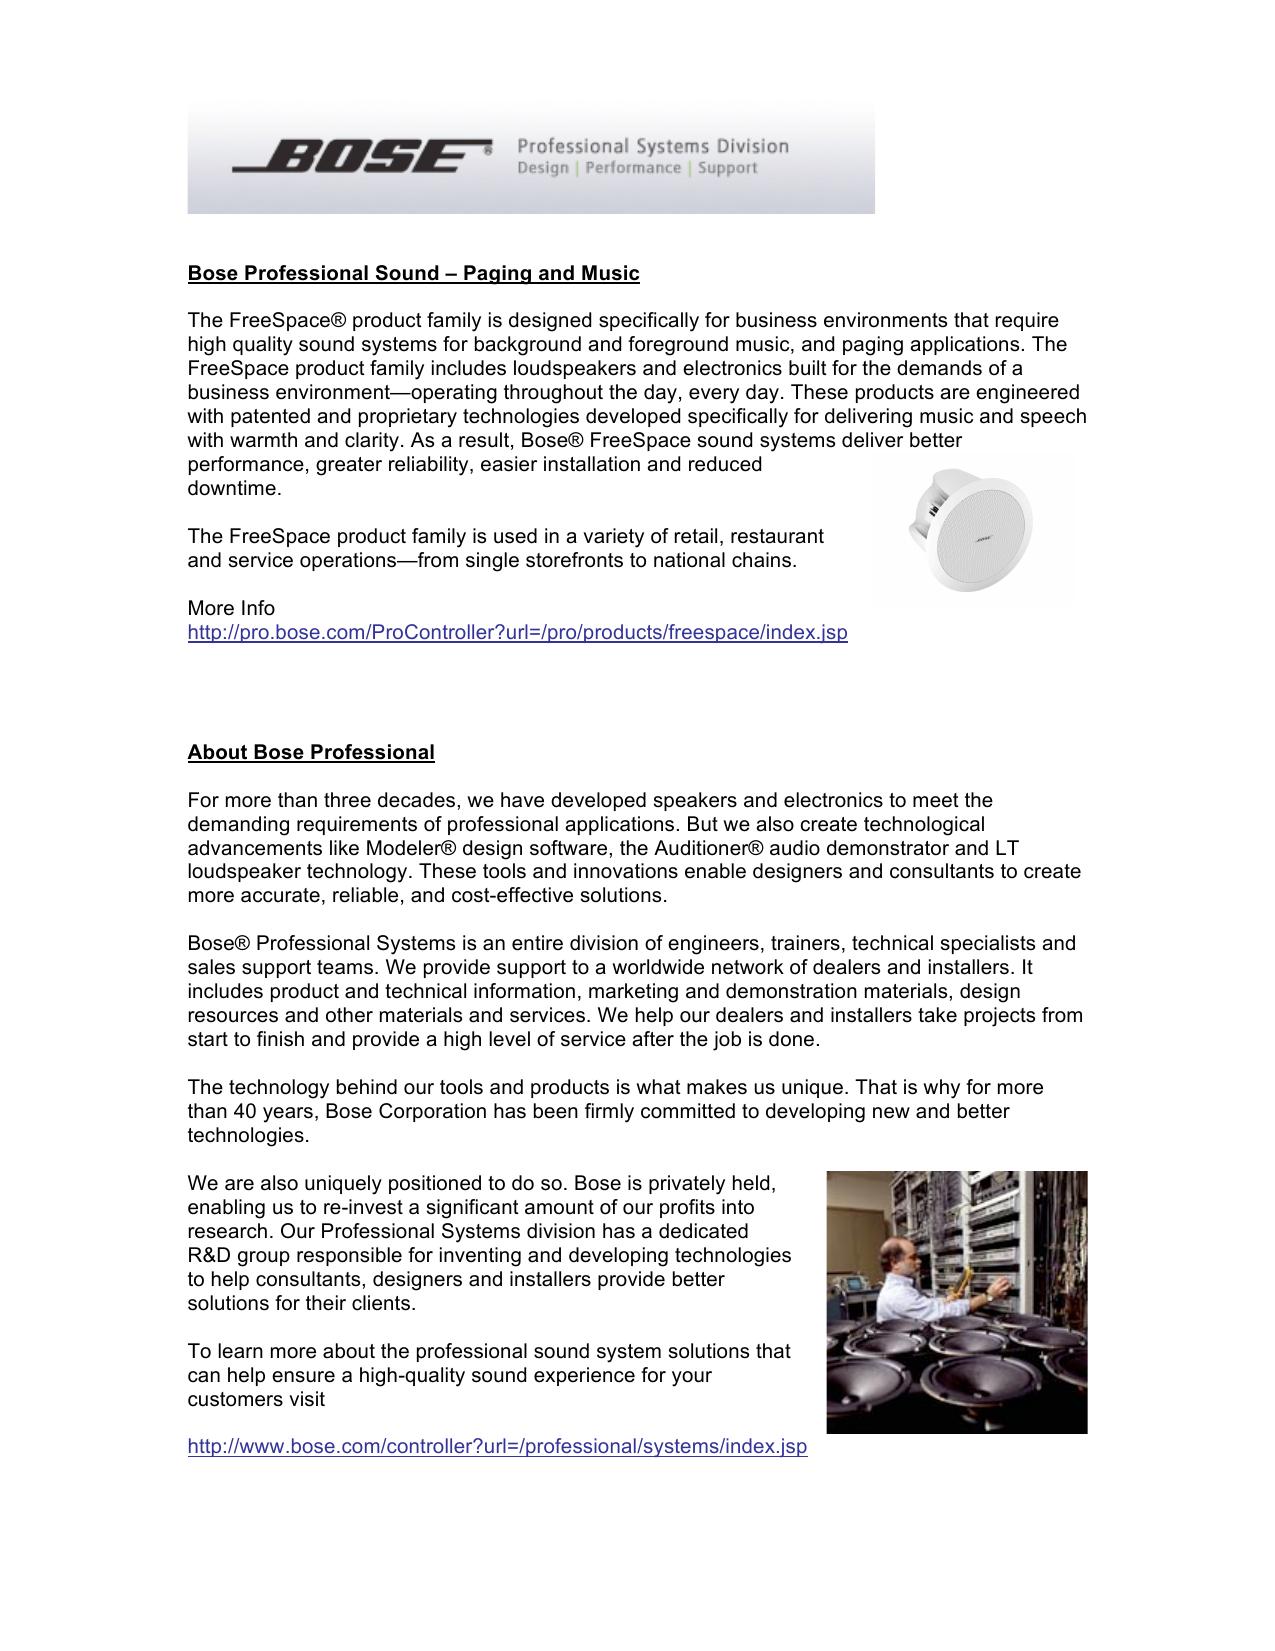 Bose Professional Sound - Prime Communications Services Ltd